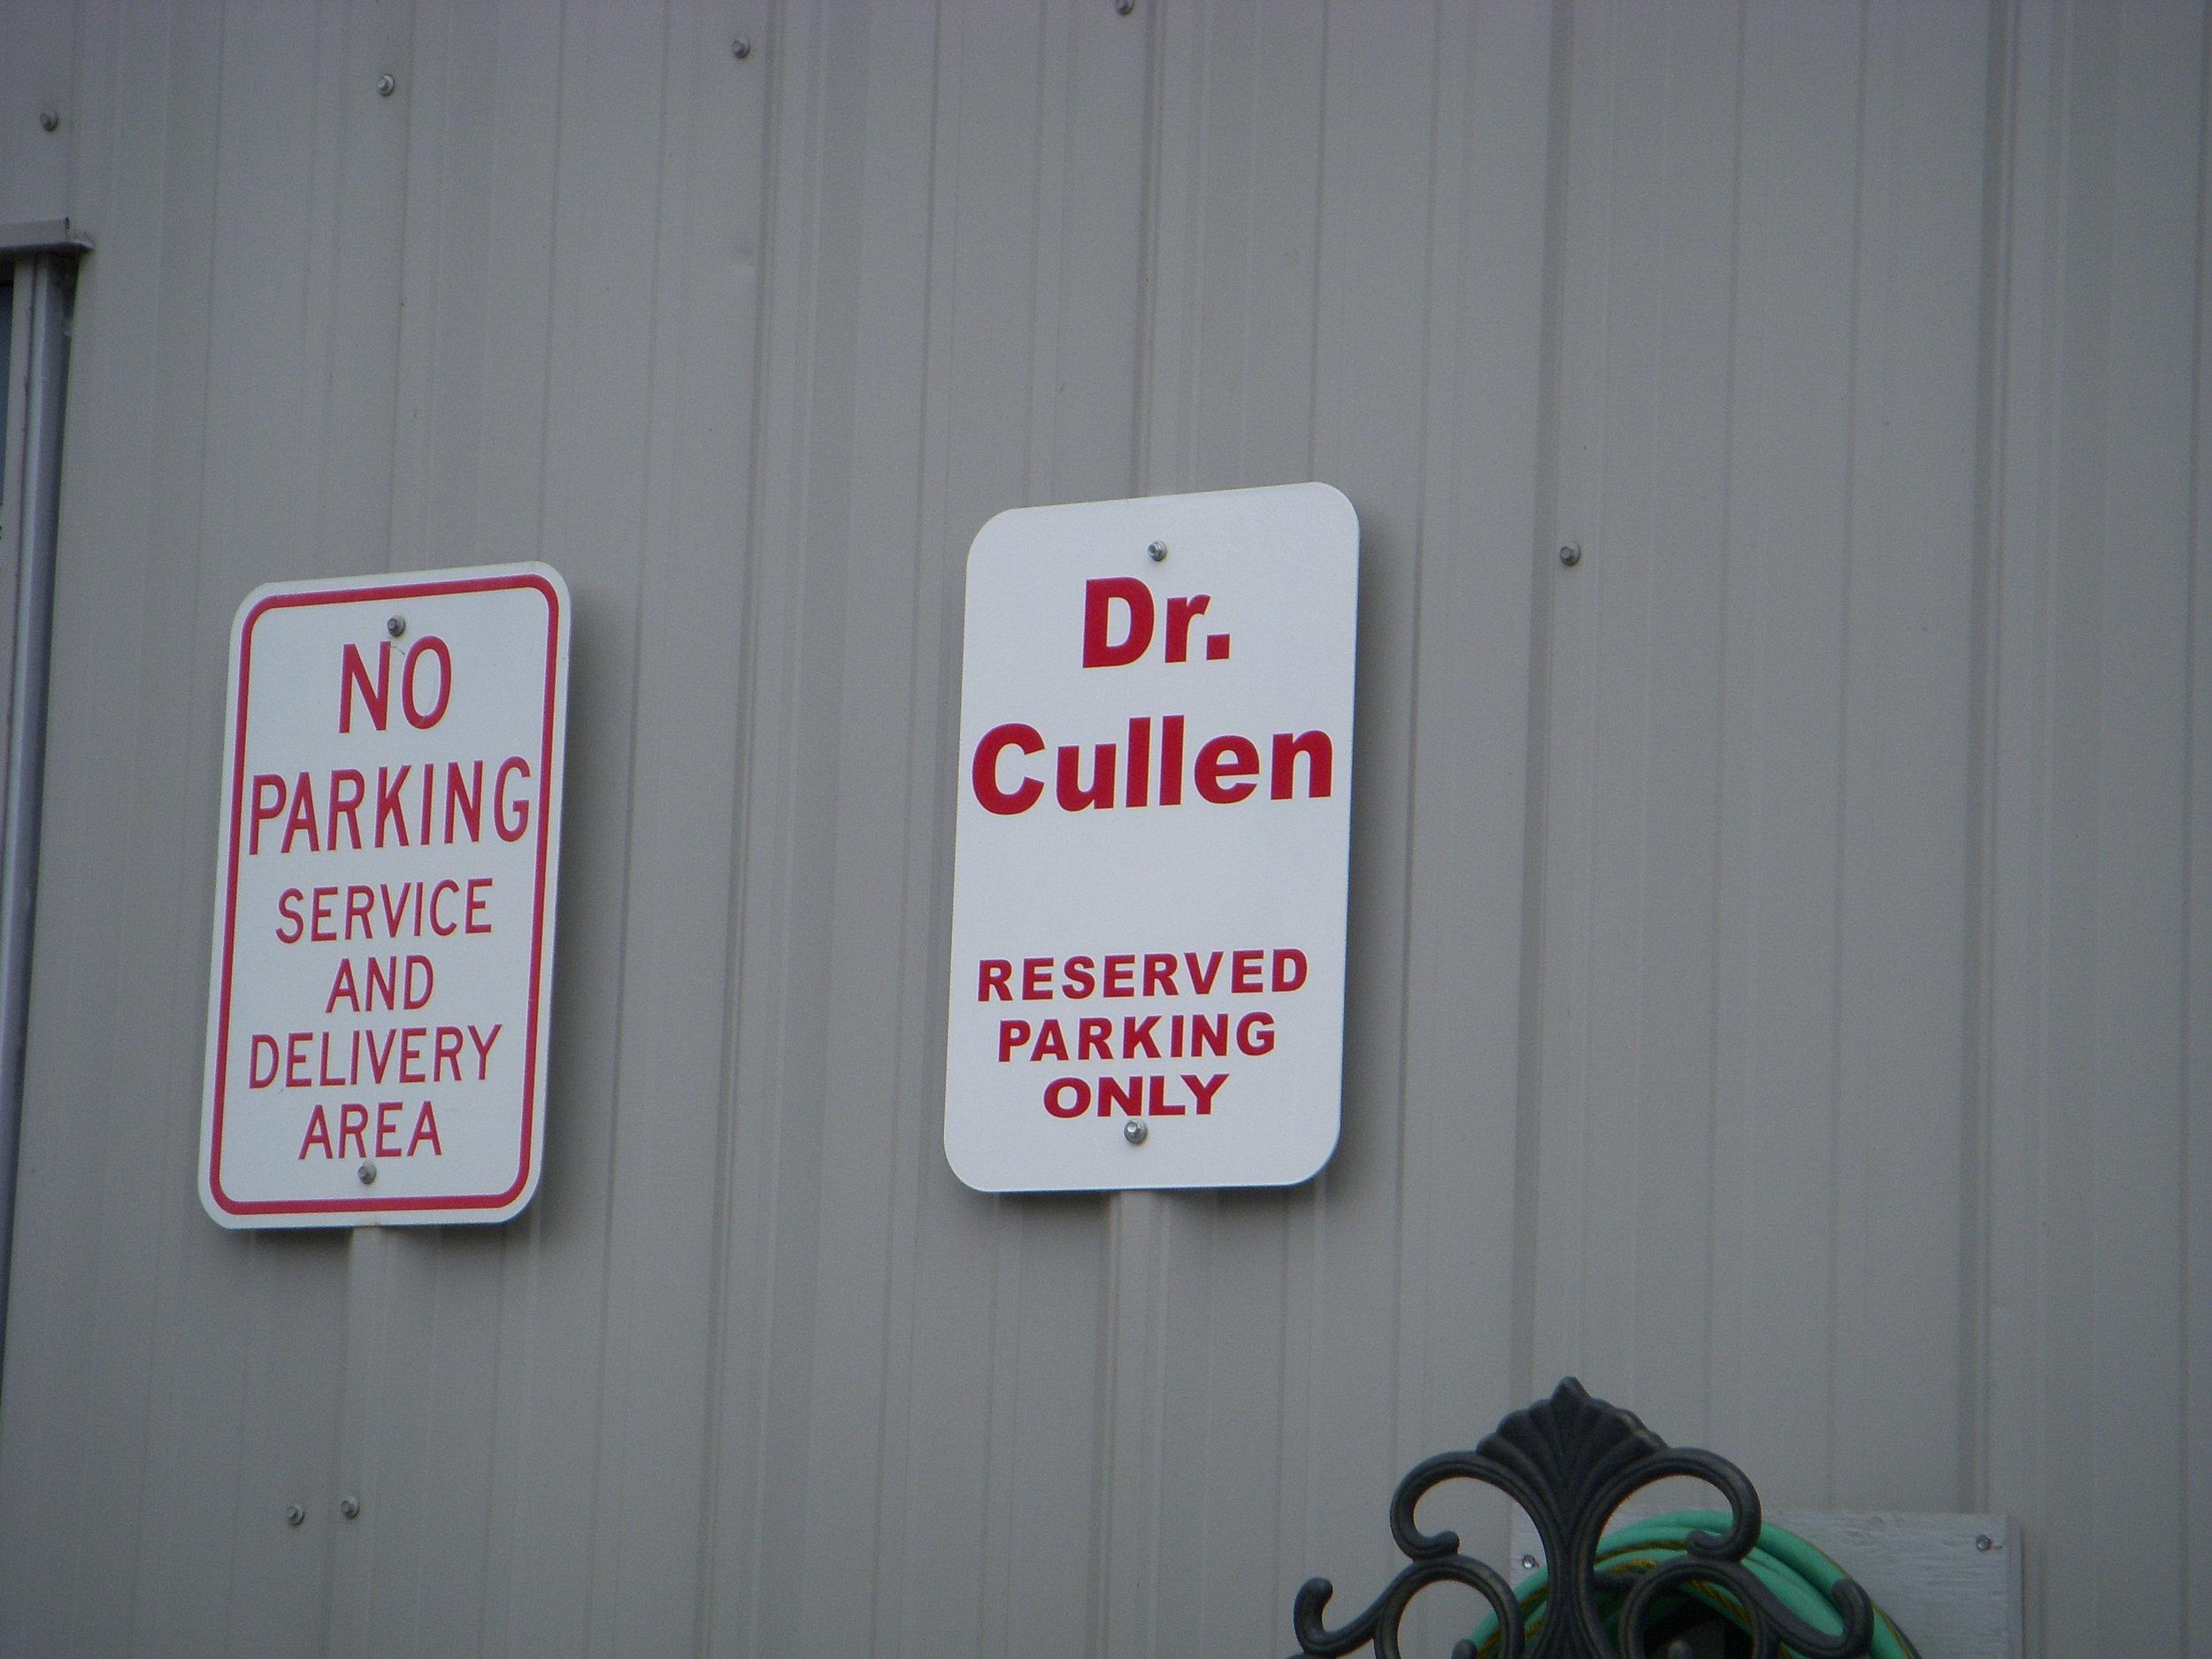 Dr cullen